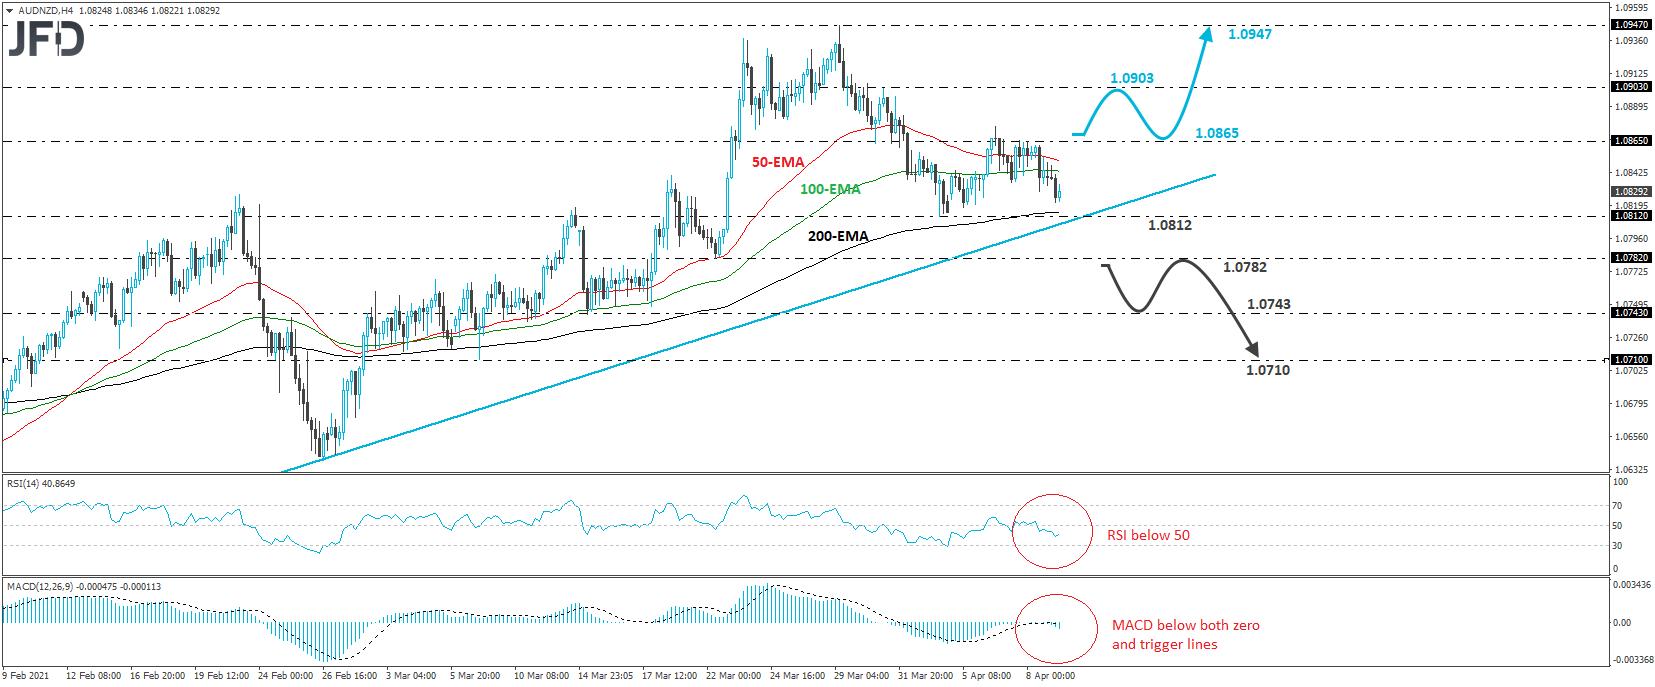 AUD/NZD 4-hour chart technical analysis